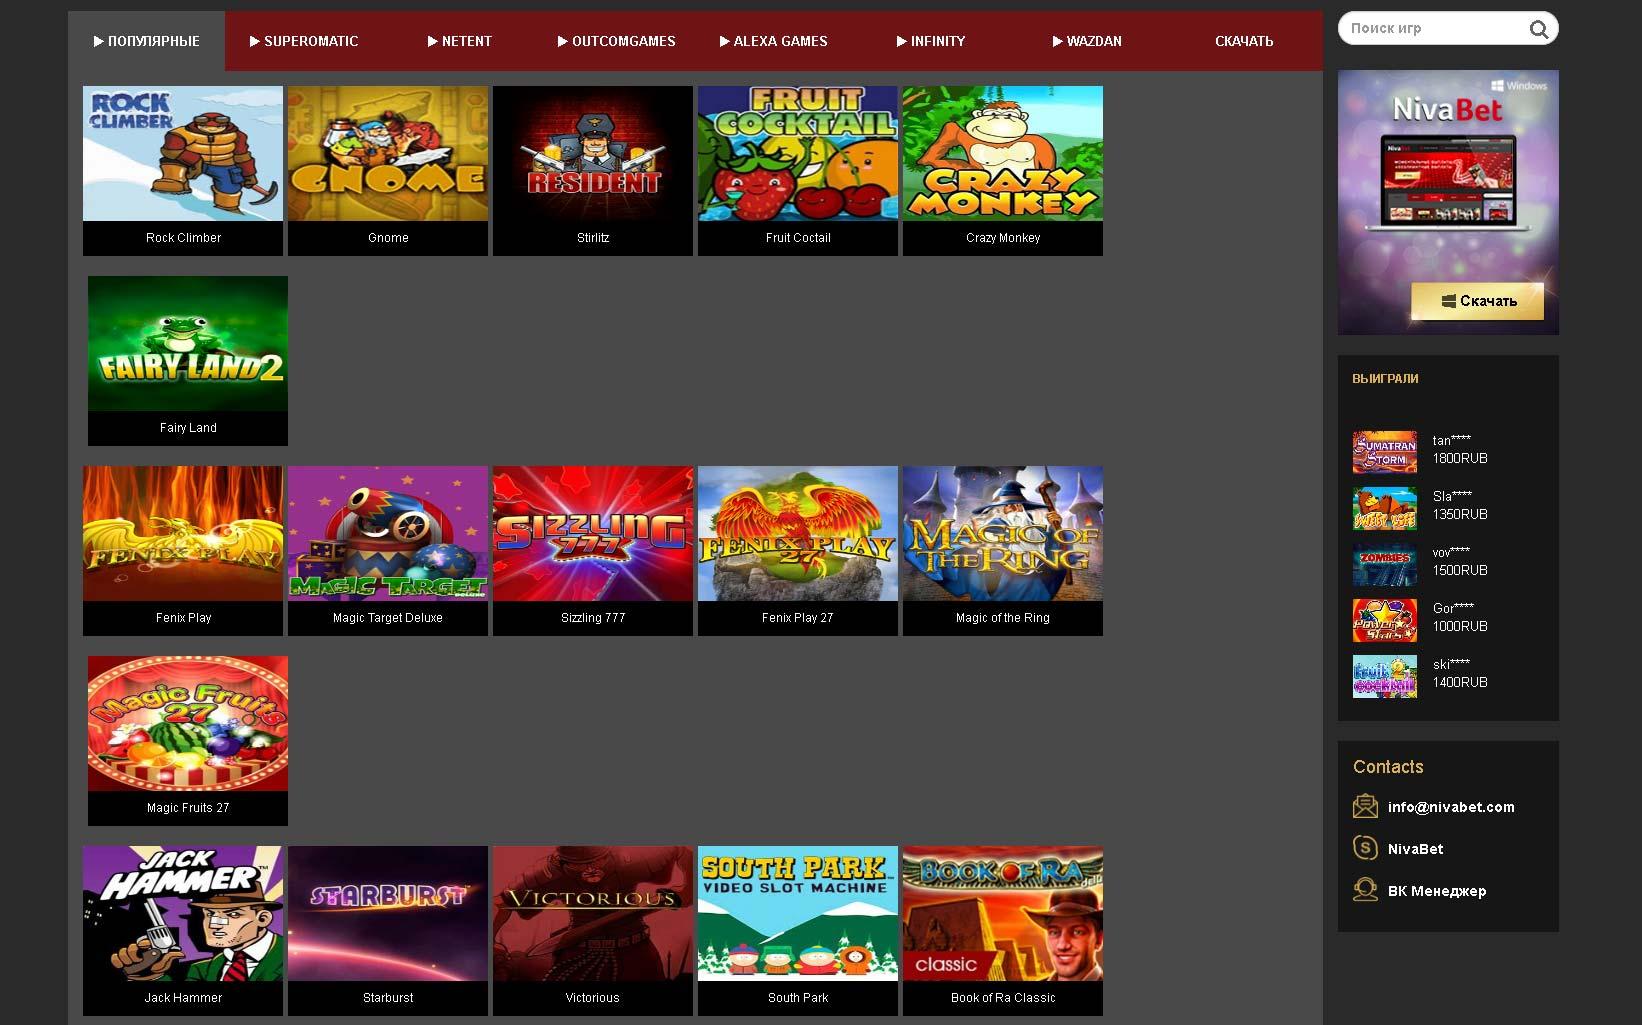 официальный сайт нивабет казино онлайн зеркало